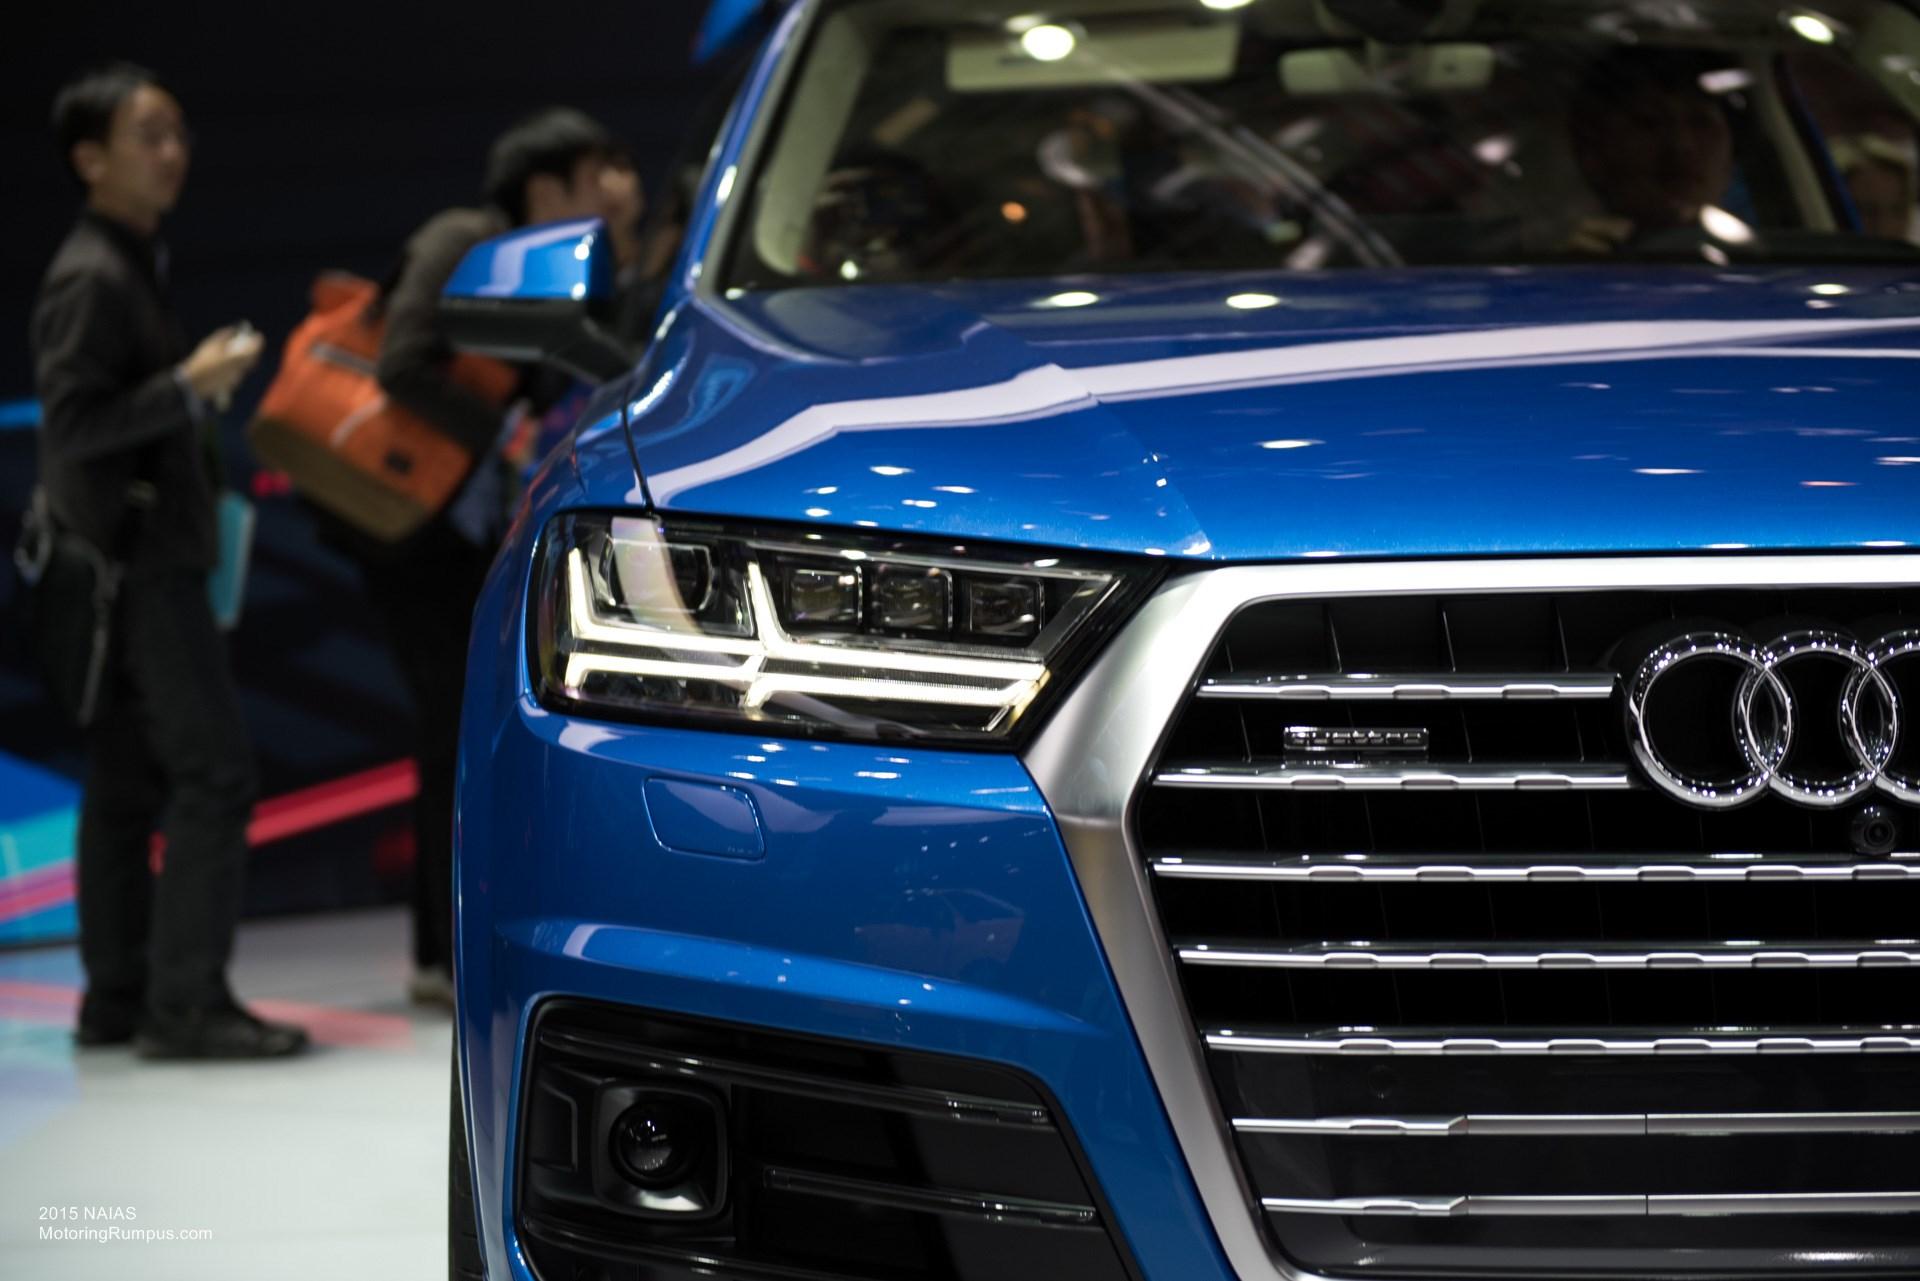 2015 NAIAS Audi Q7 Headlight